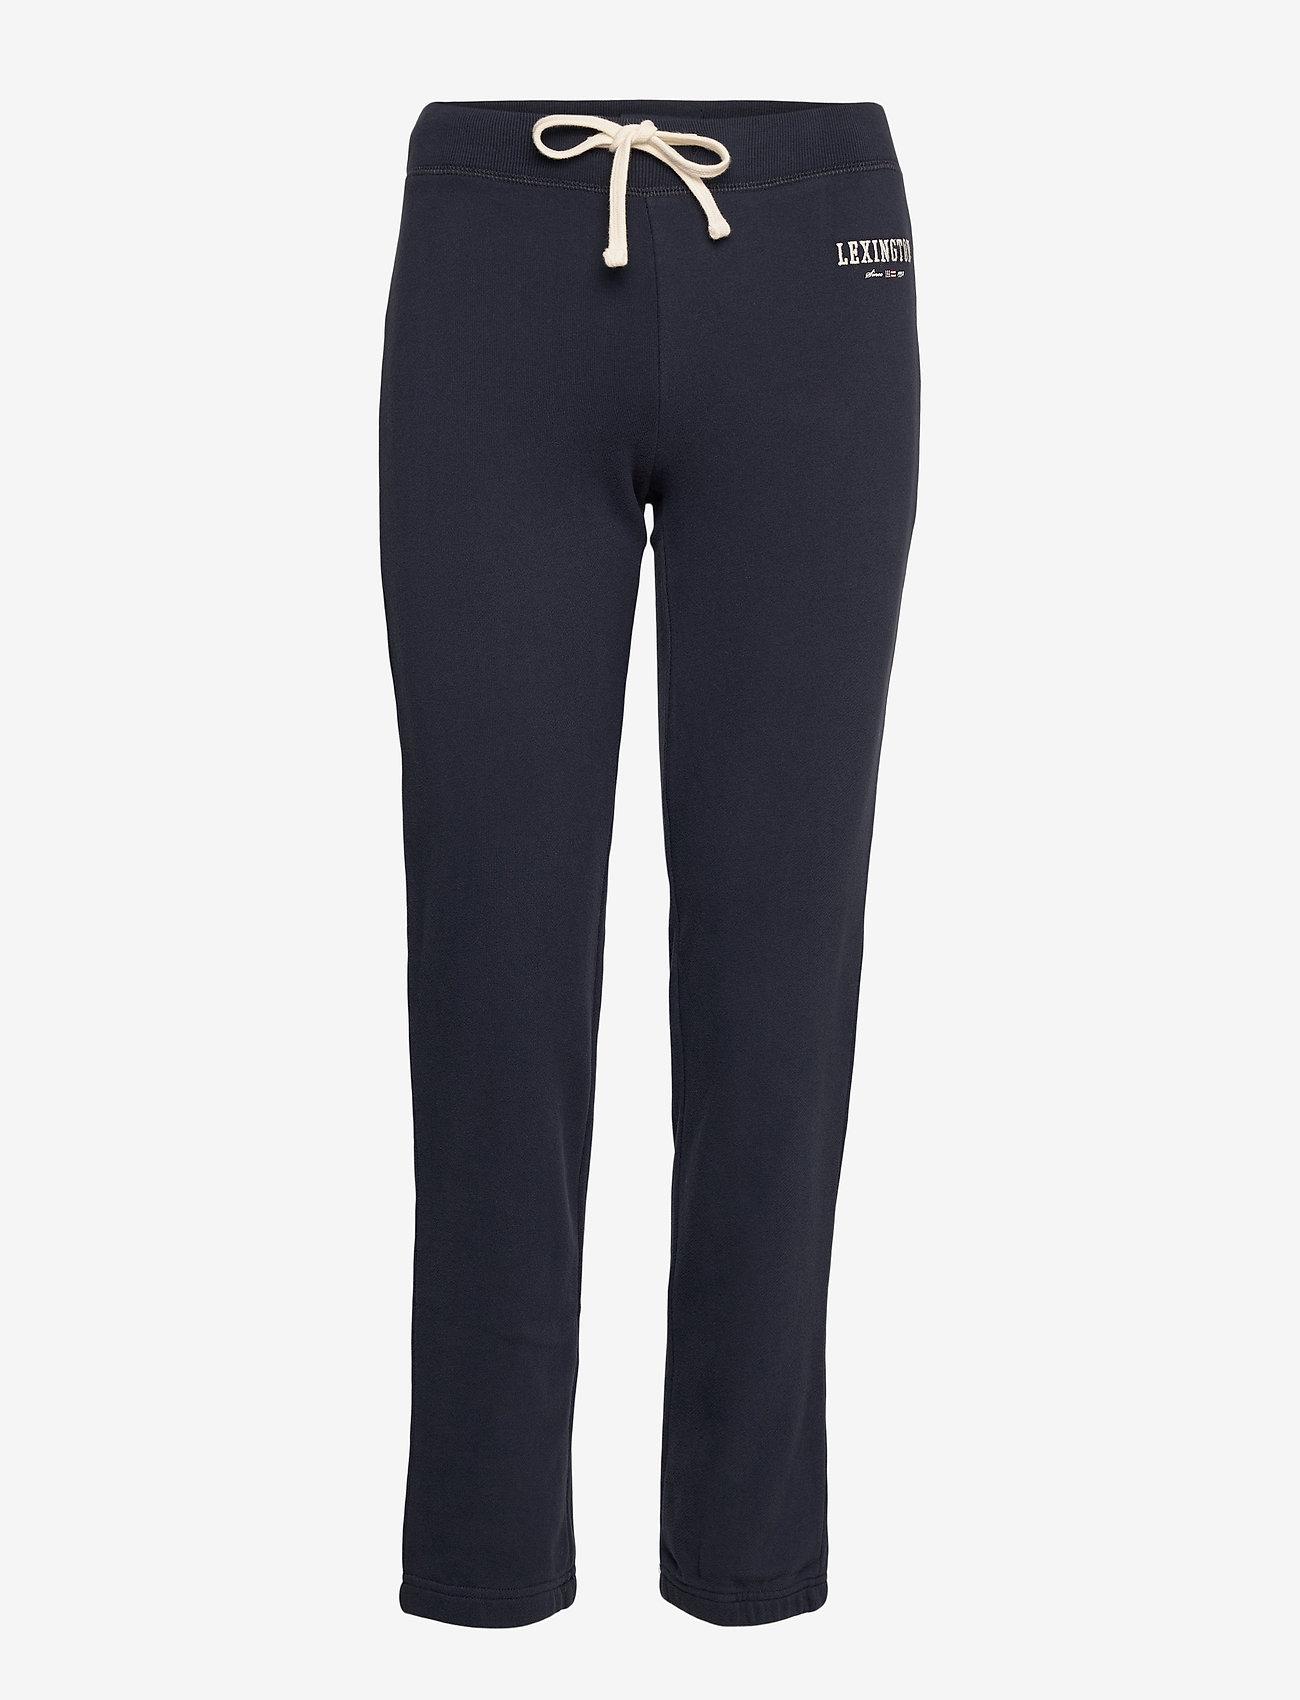 Lexington Clothing - Jenna Pants - sweatpants - dark blue - 0